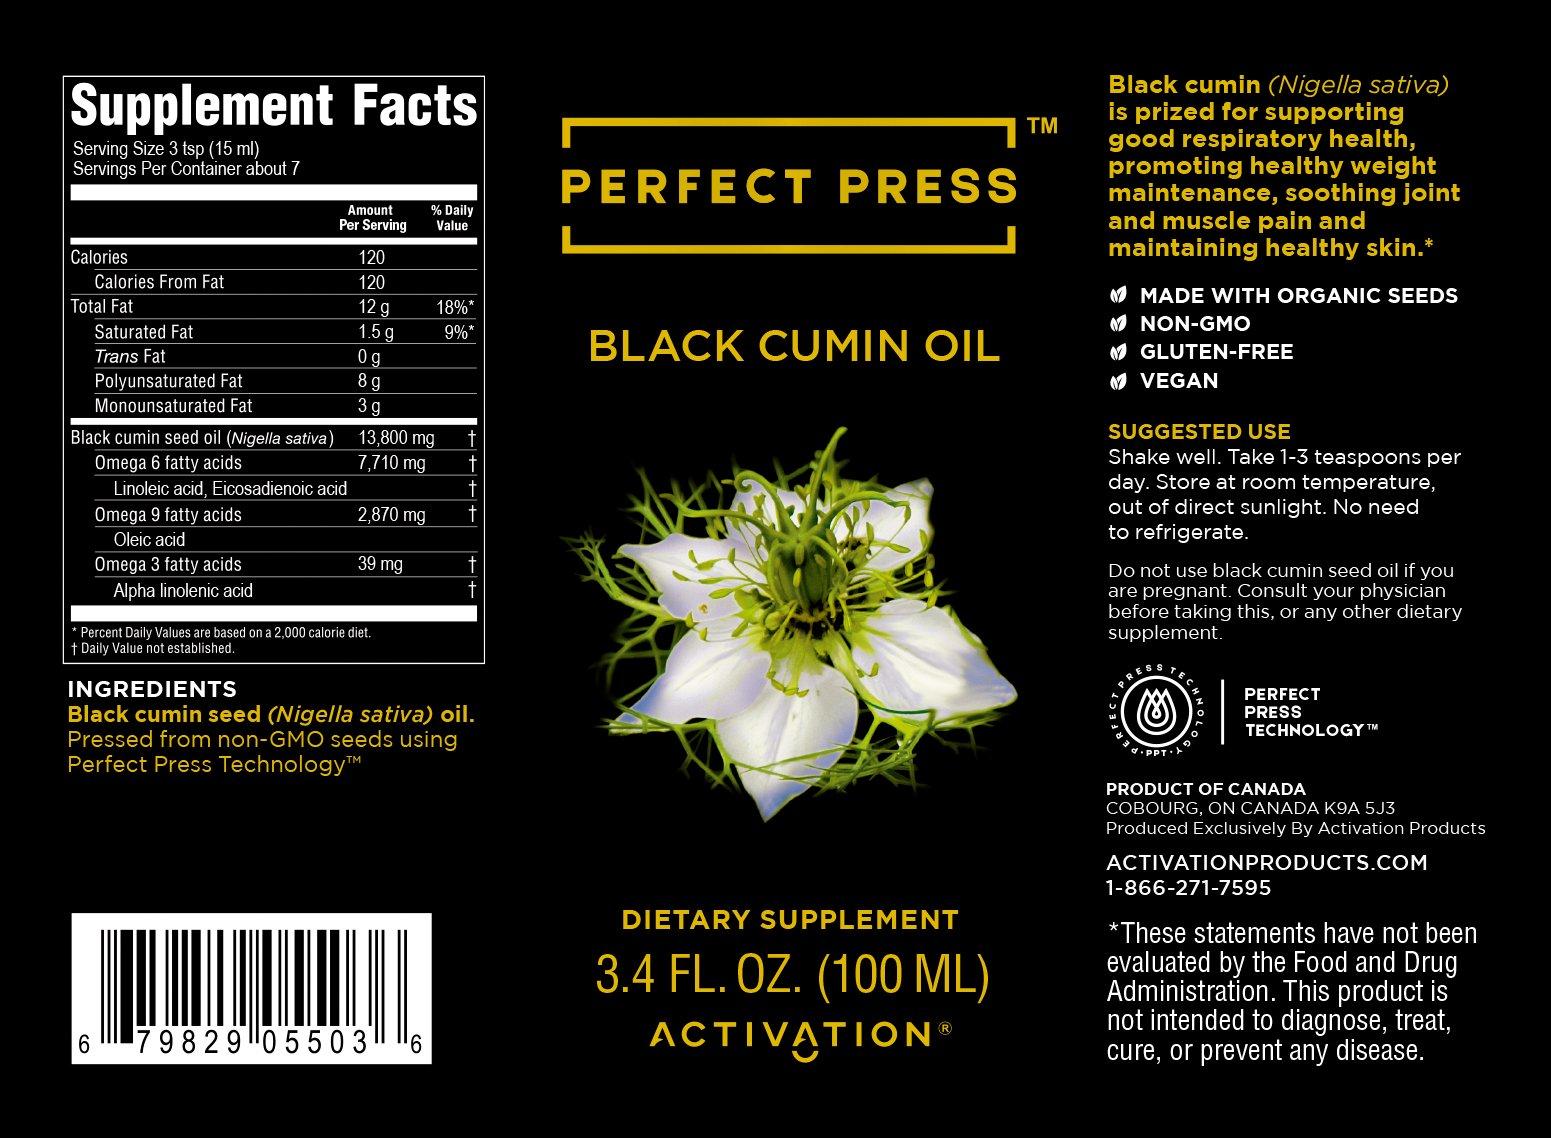 Activation Products, Perfect Press, Black Cumin Seed Oil, Vegan, Organic & Gluten Free, Pure Nigella Sativa. Digestive Support, Immune System Booster, Loaded with Vitamins b1 b2 b3 (100ml)